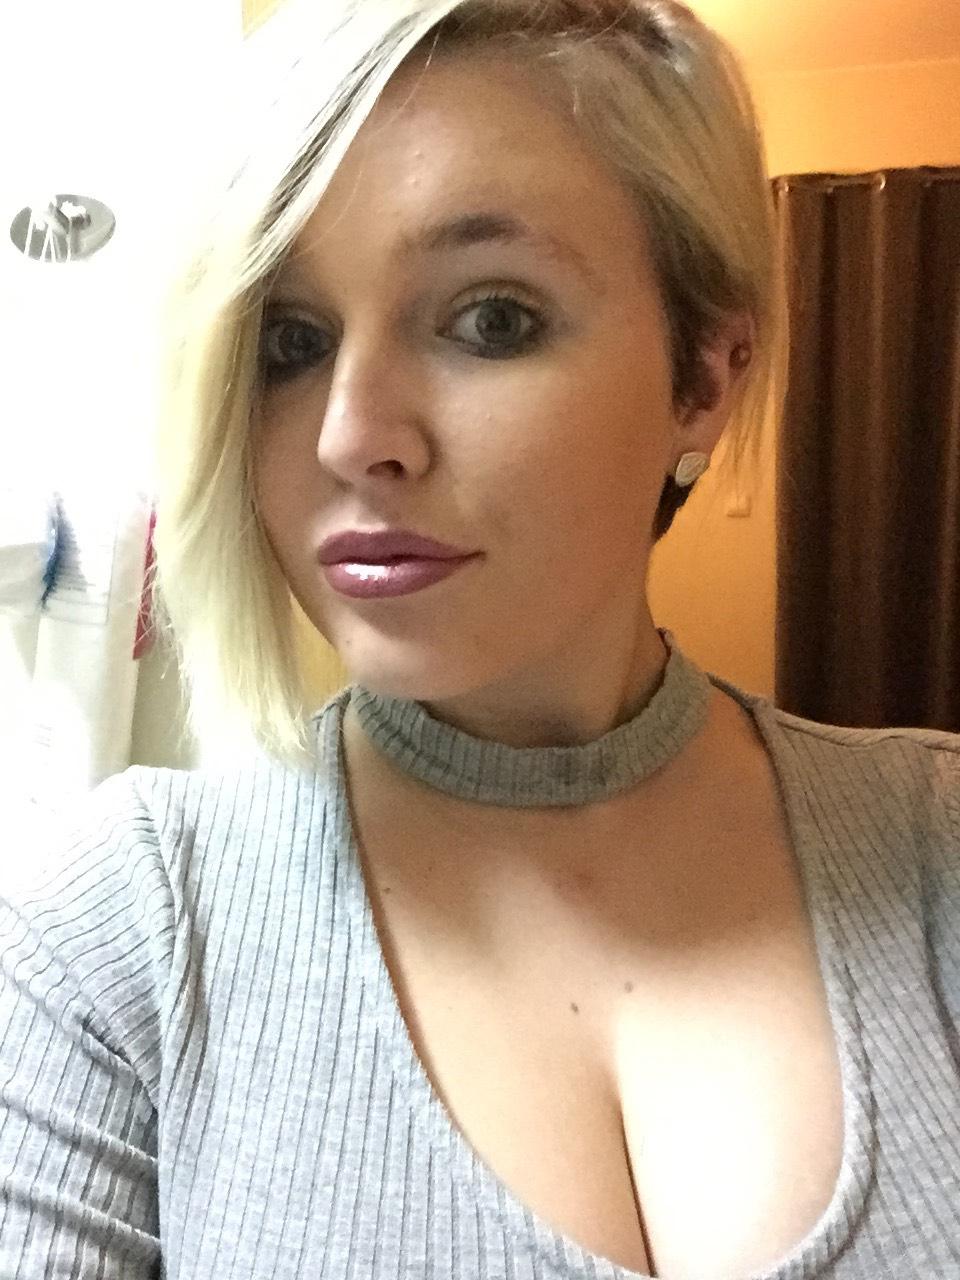 Promo Model - Megan